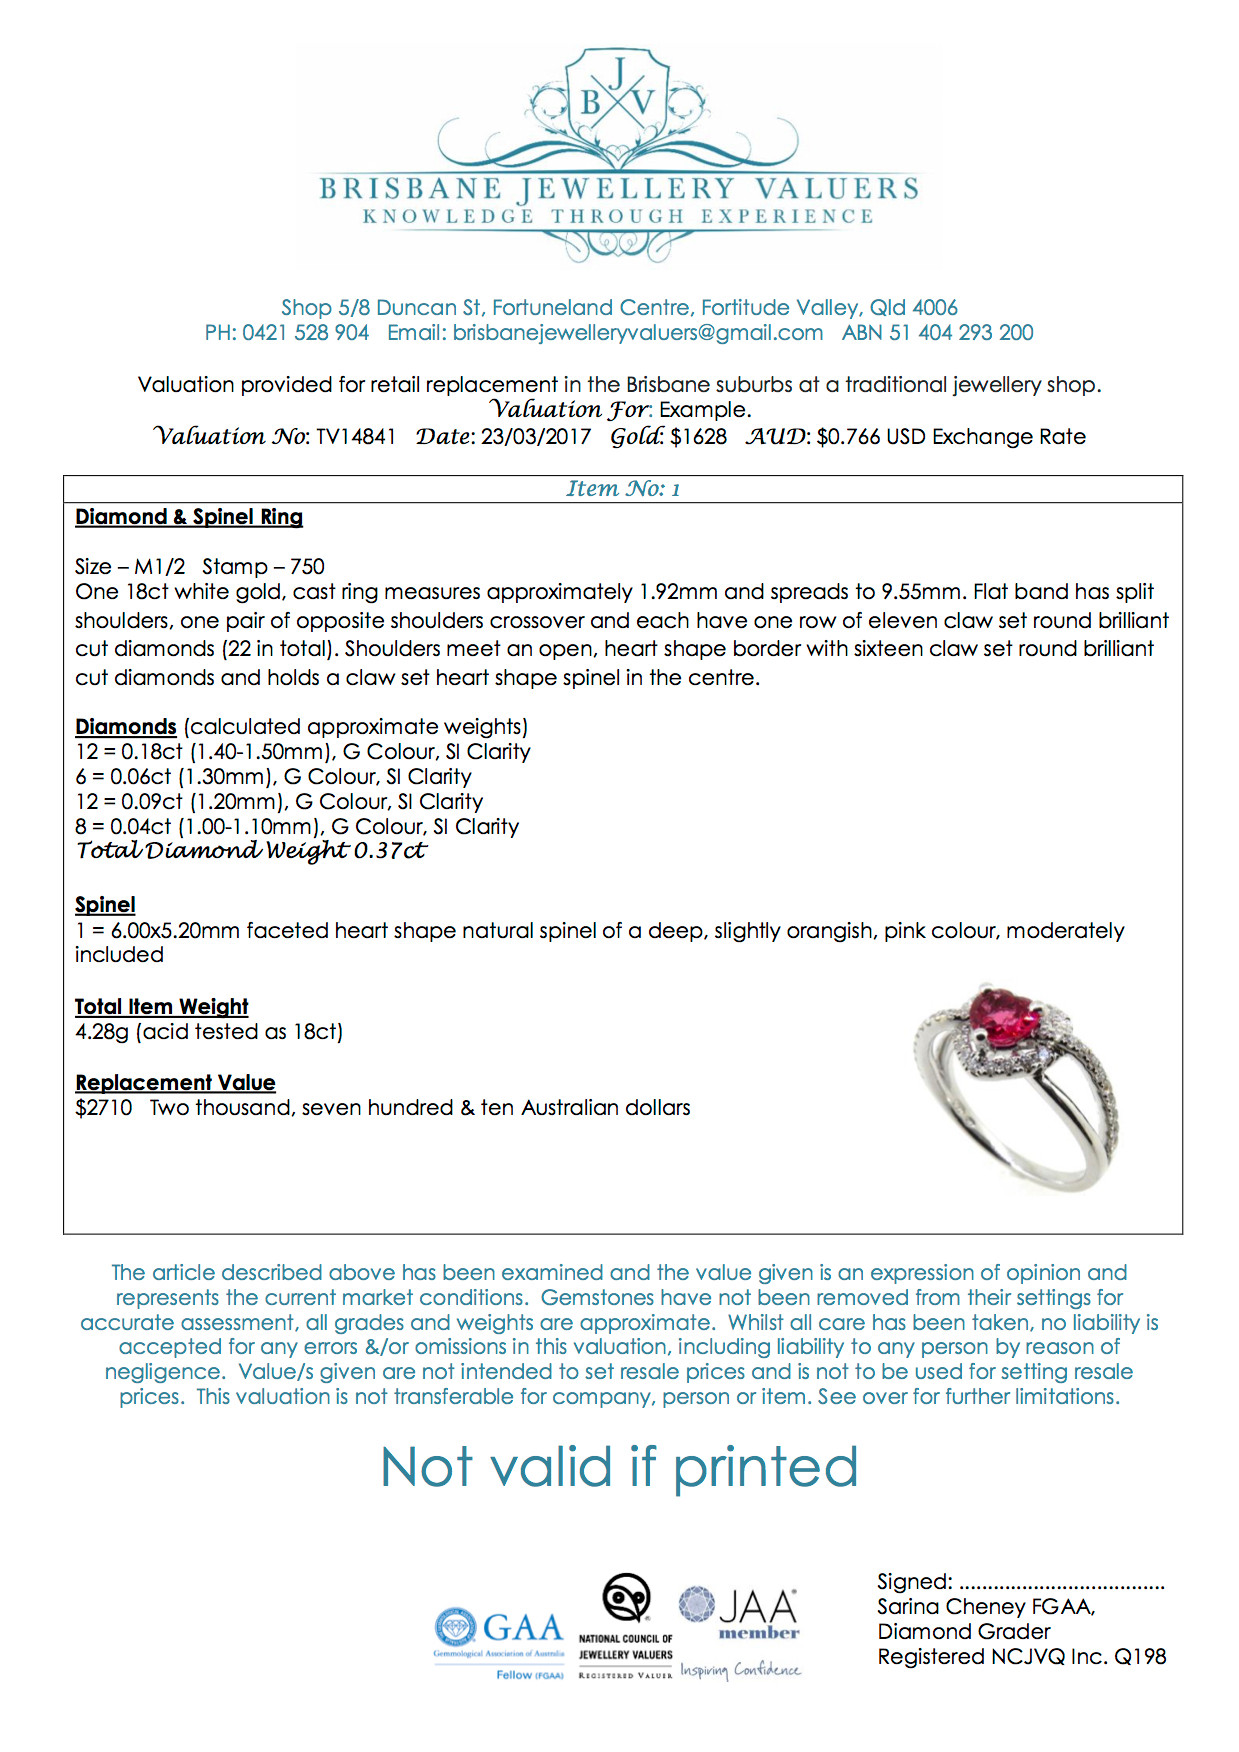 Independent Jewellery Valuation